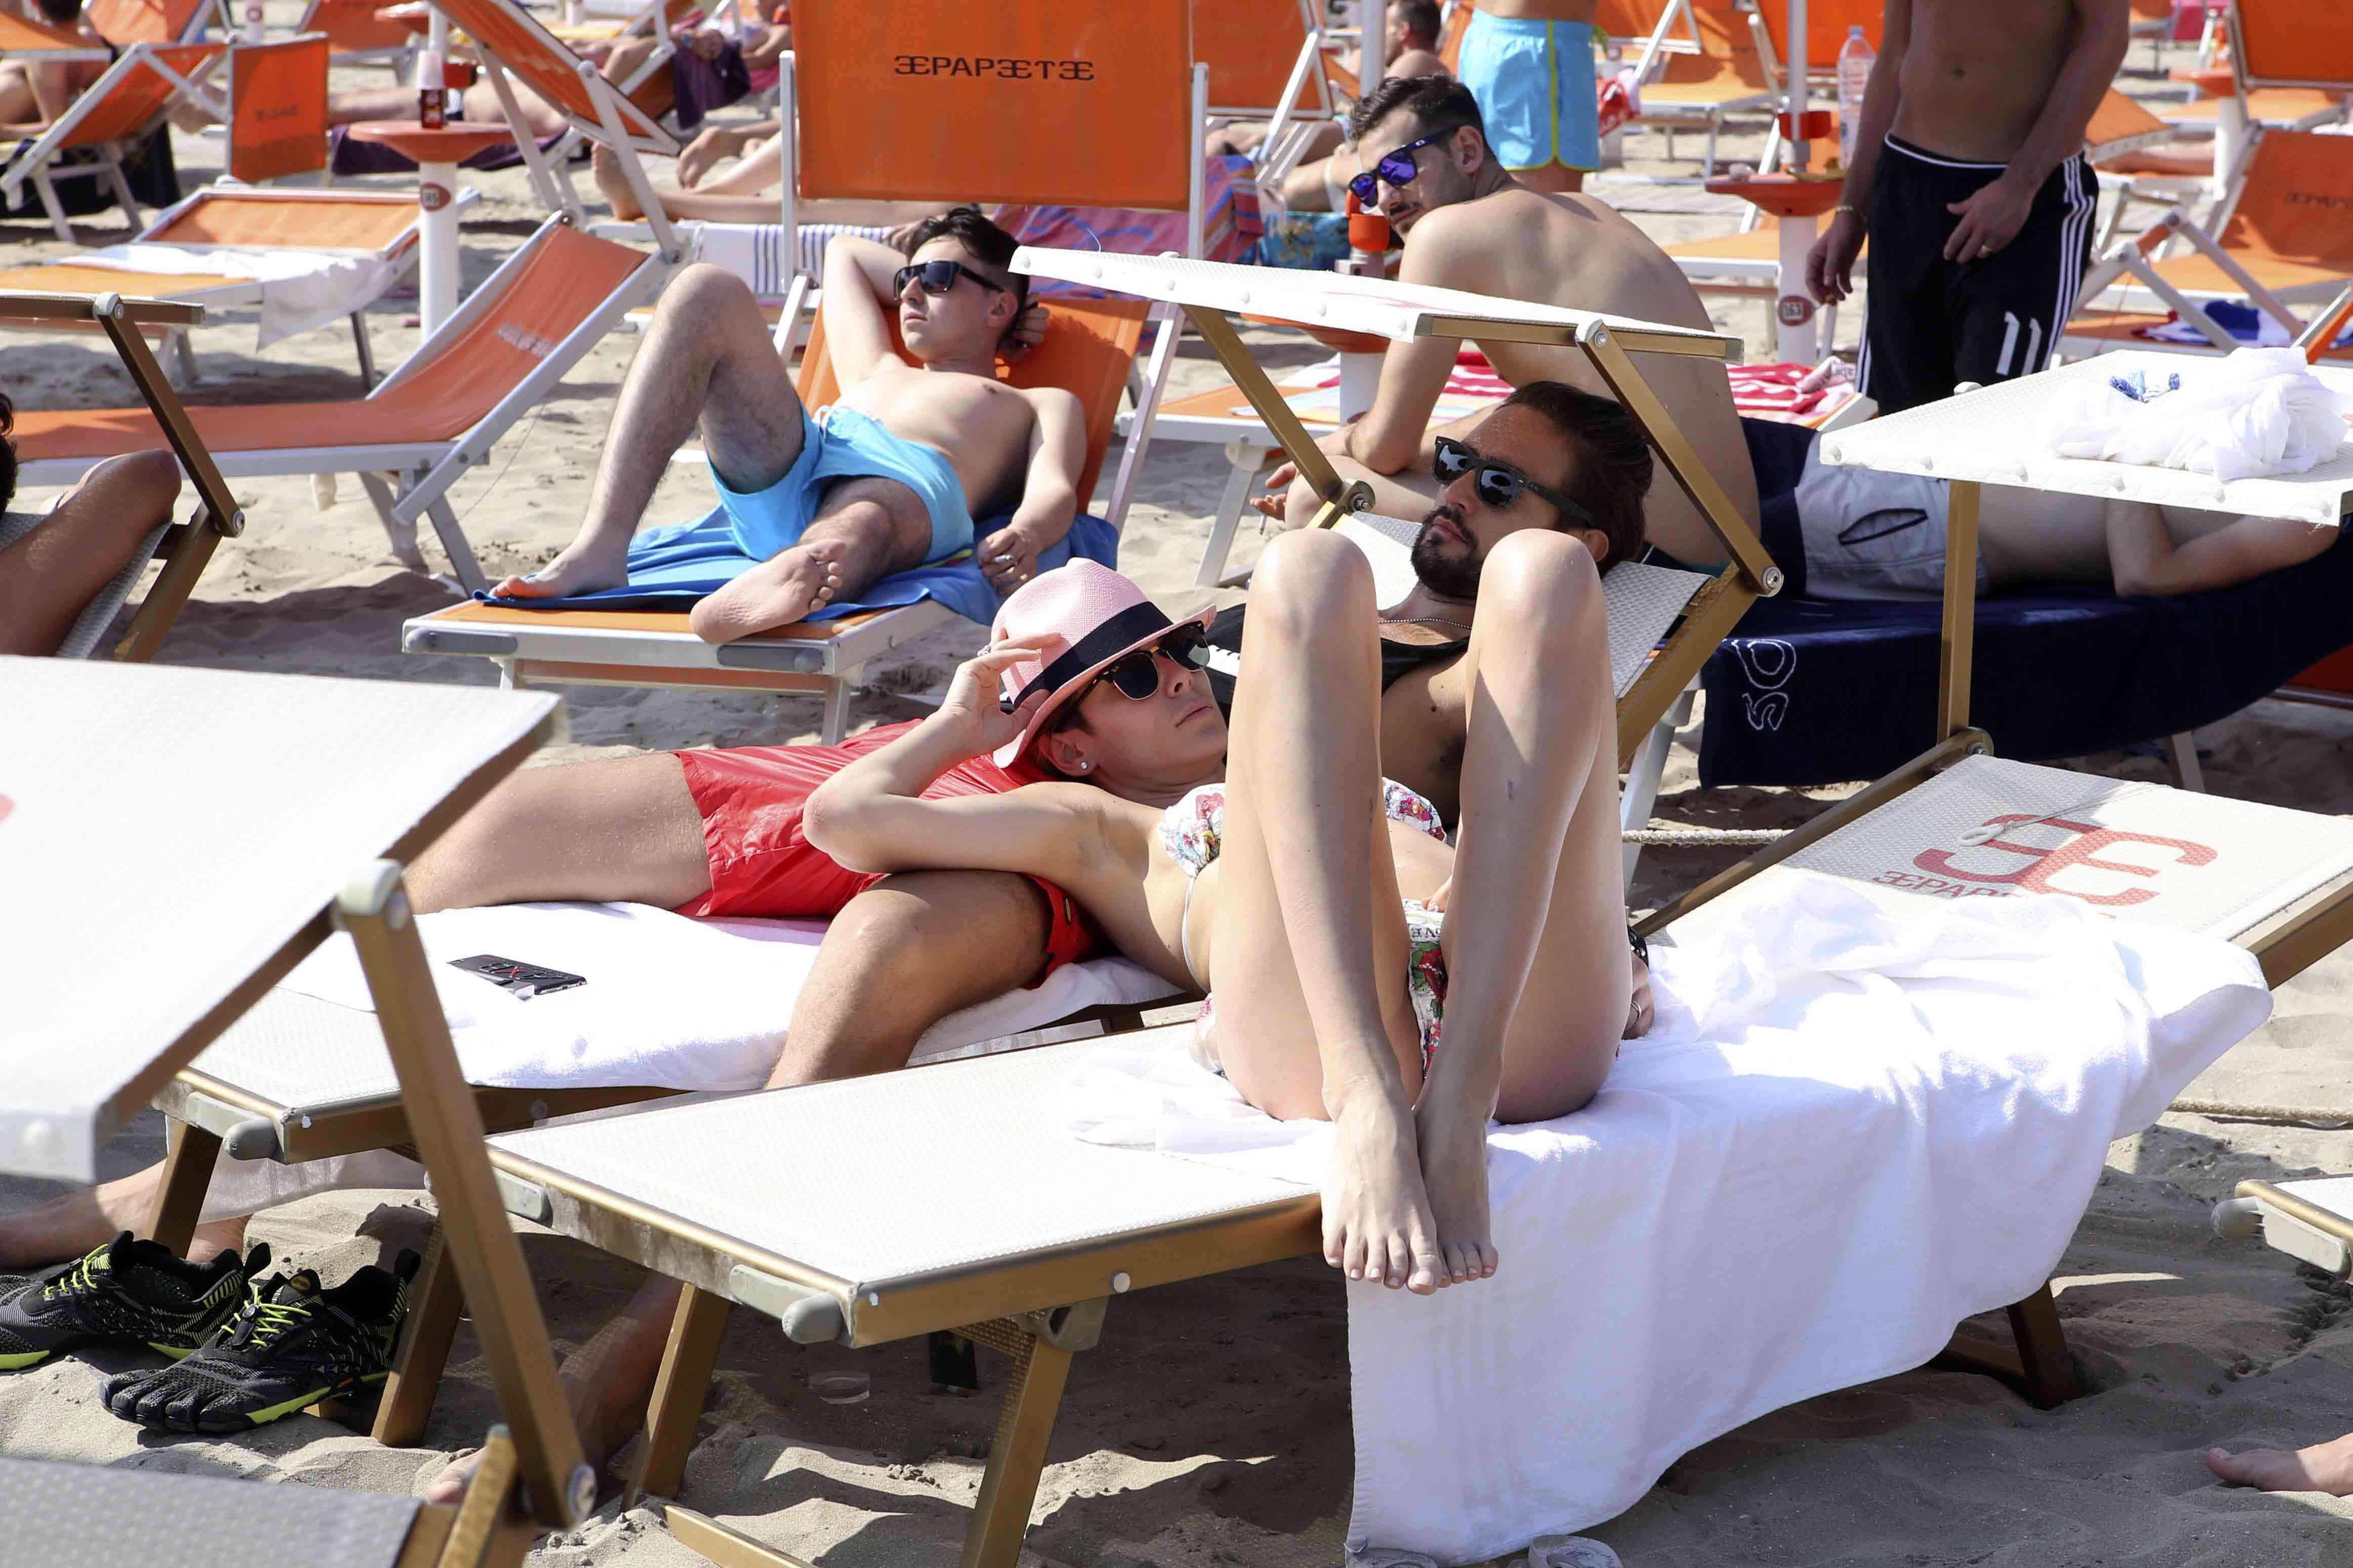 Alex belli Katarina Raniakova milano marittima sole mare relax